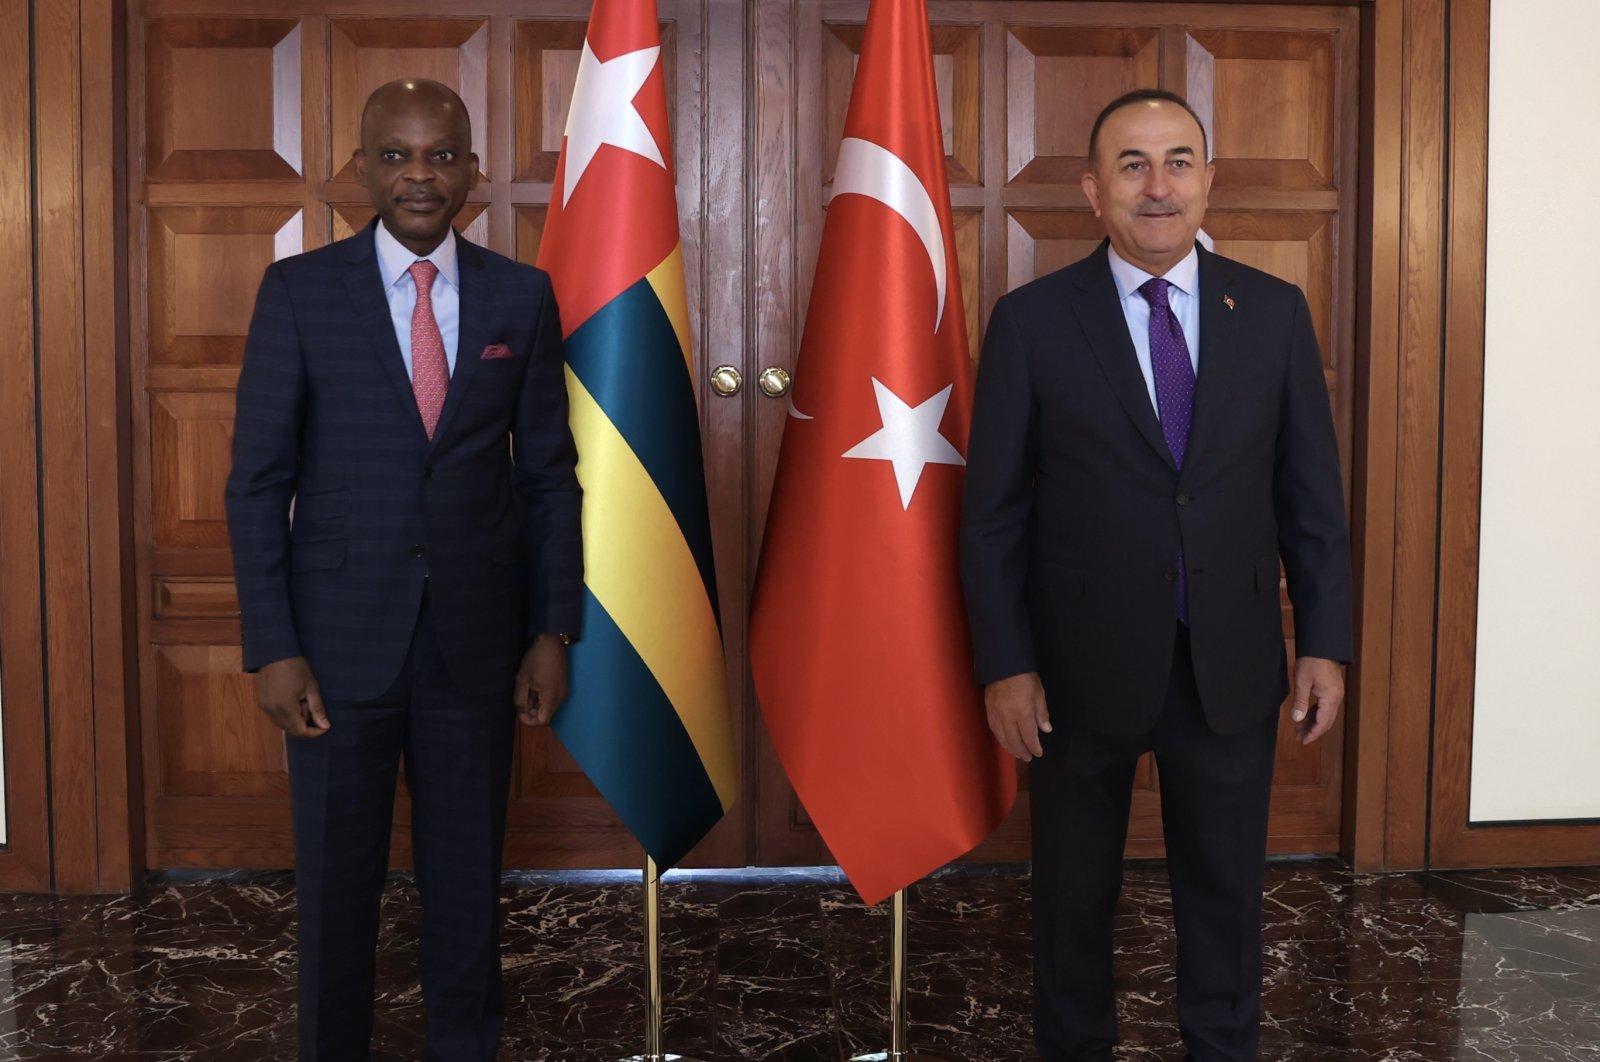 Foreign Minister Mevlüt Çavuşoğlu (R) and his Togolese counterpart Robert Dussey in the Turkish capital Ankara, July 26, 2021. (AA Photo)